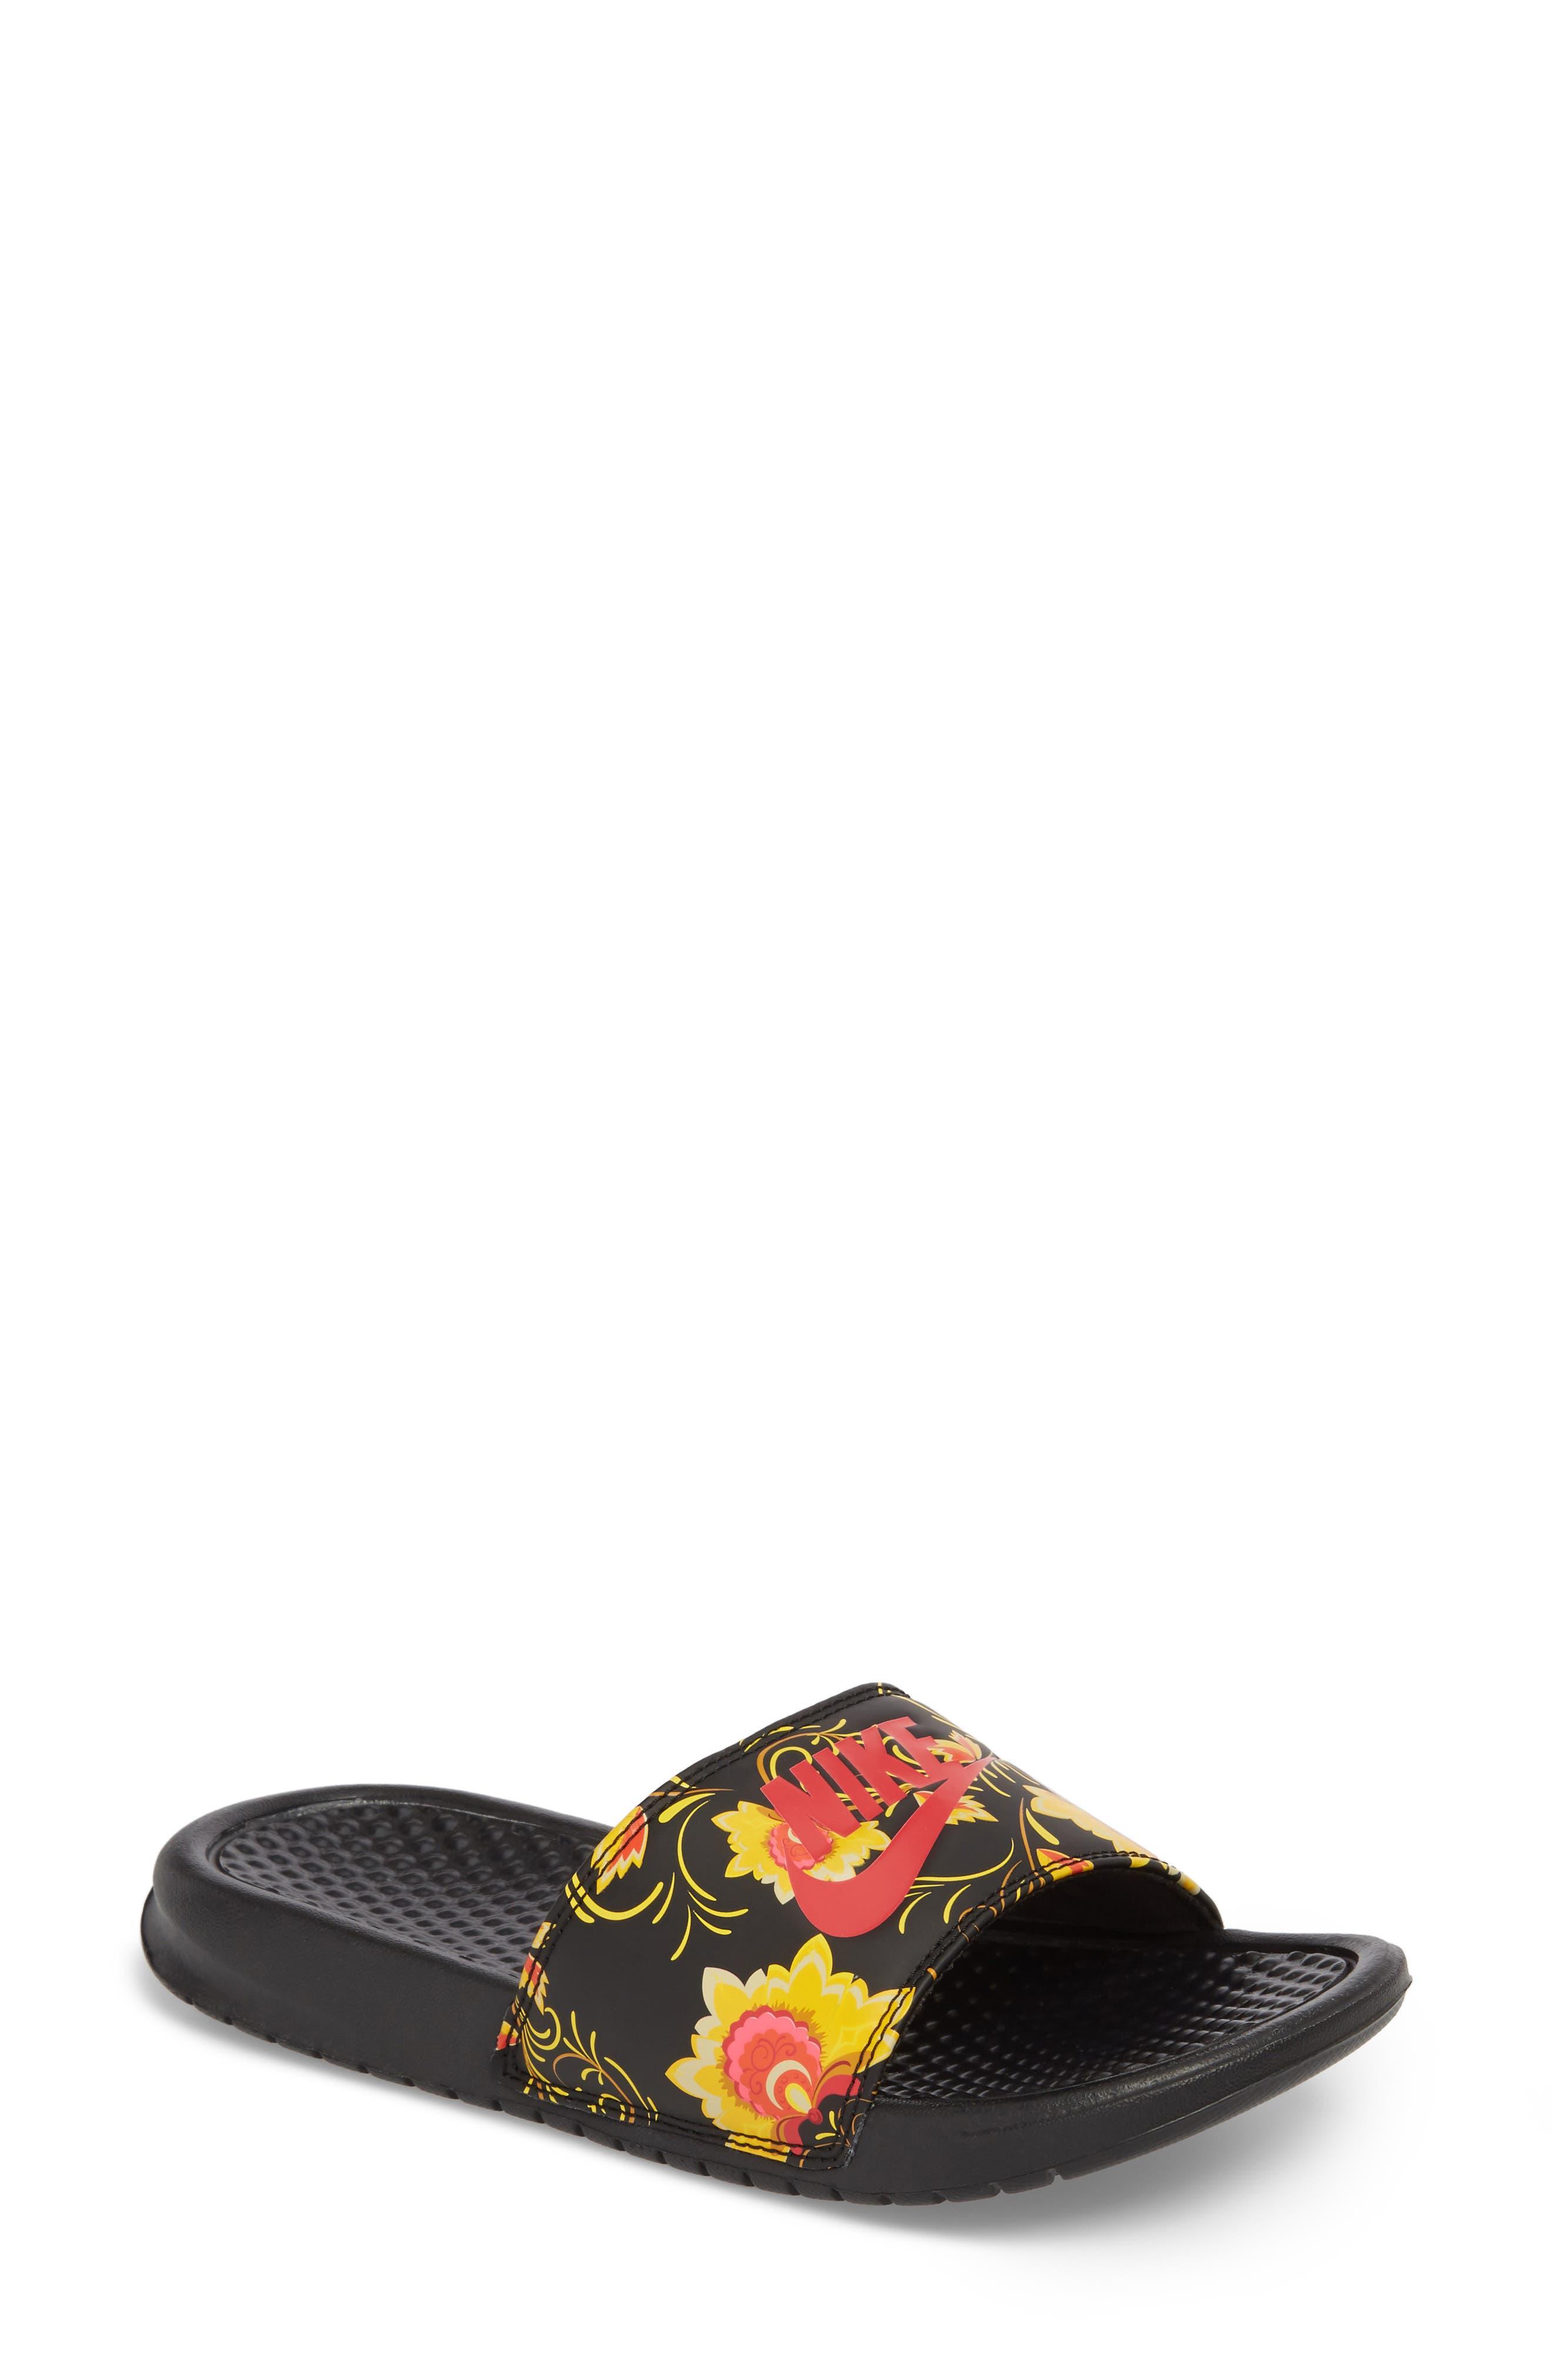 Nike Benassi Floral Print Slide Sandal (Women)